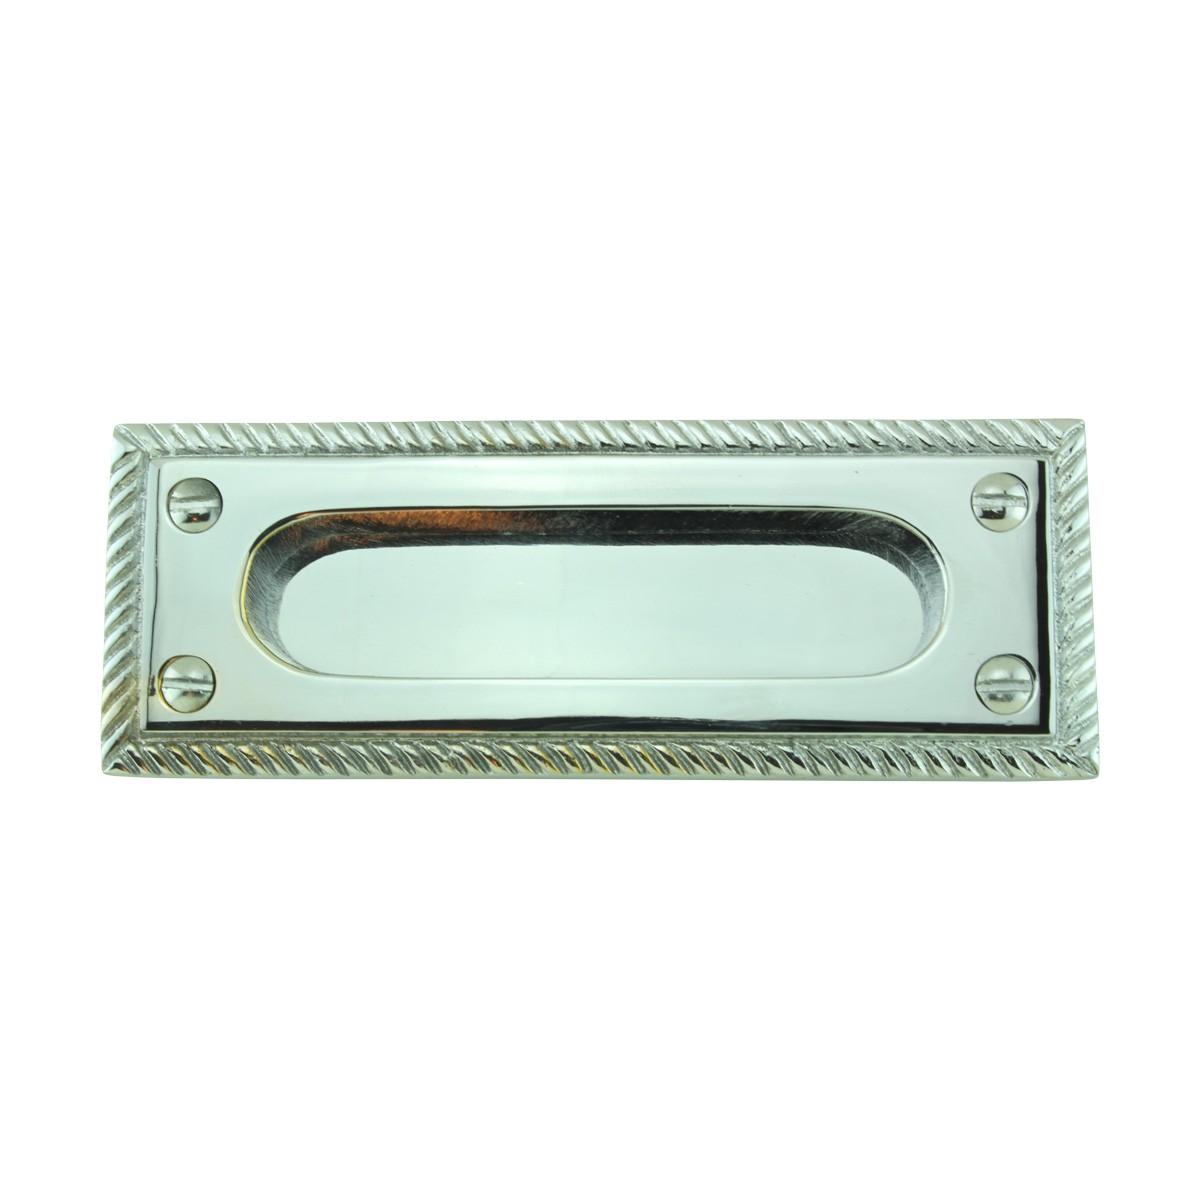 Solid Brass Sash Lift Georgian Rope Chrome Rectangular 5 Inches Sash Lift Brass Window Sash Lift Chrome Sash Lift